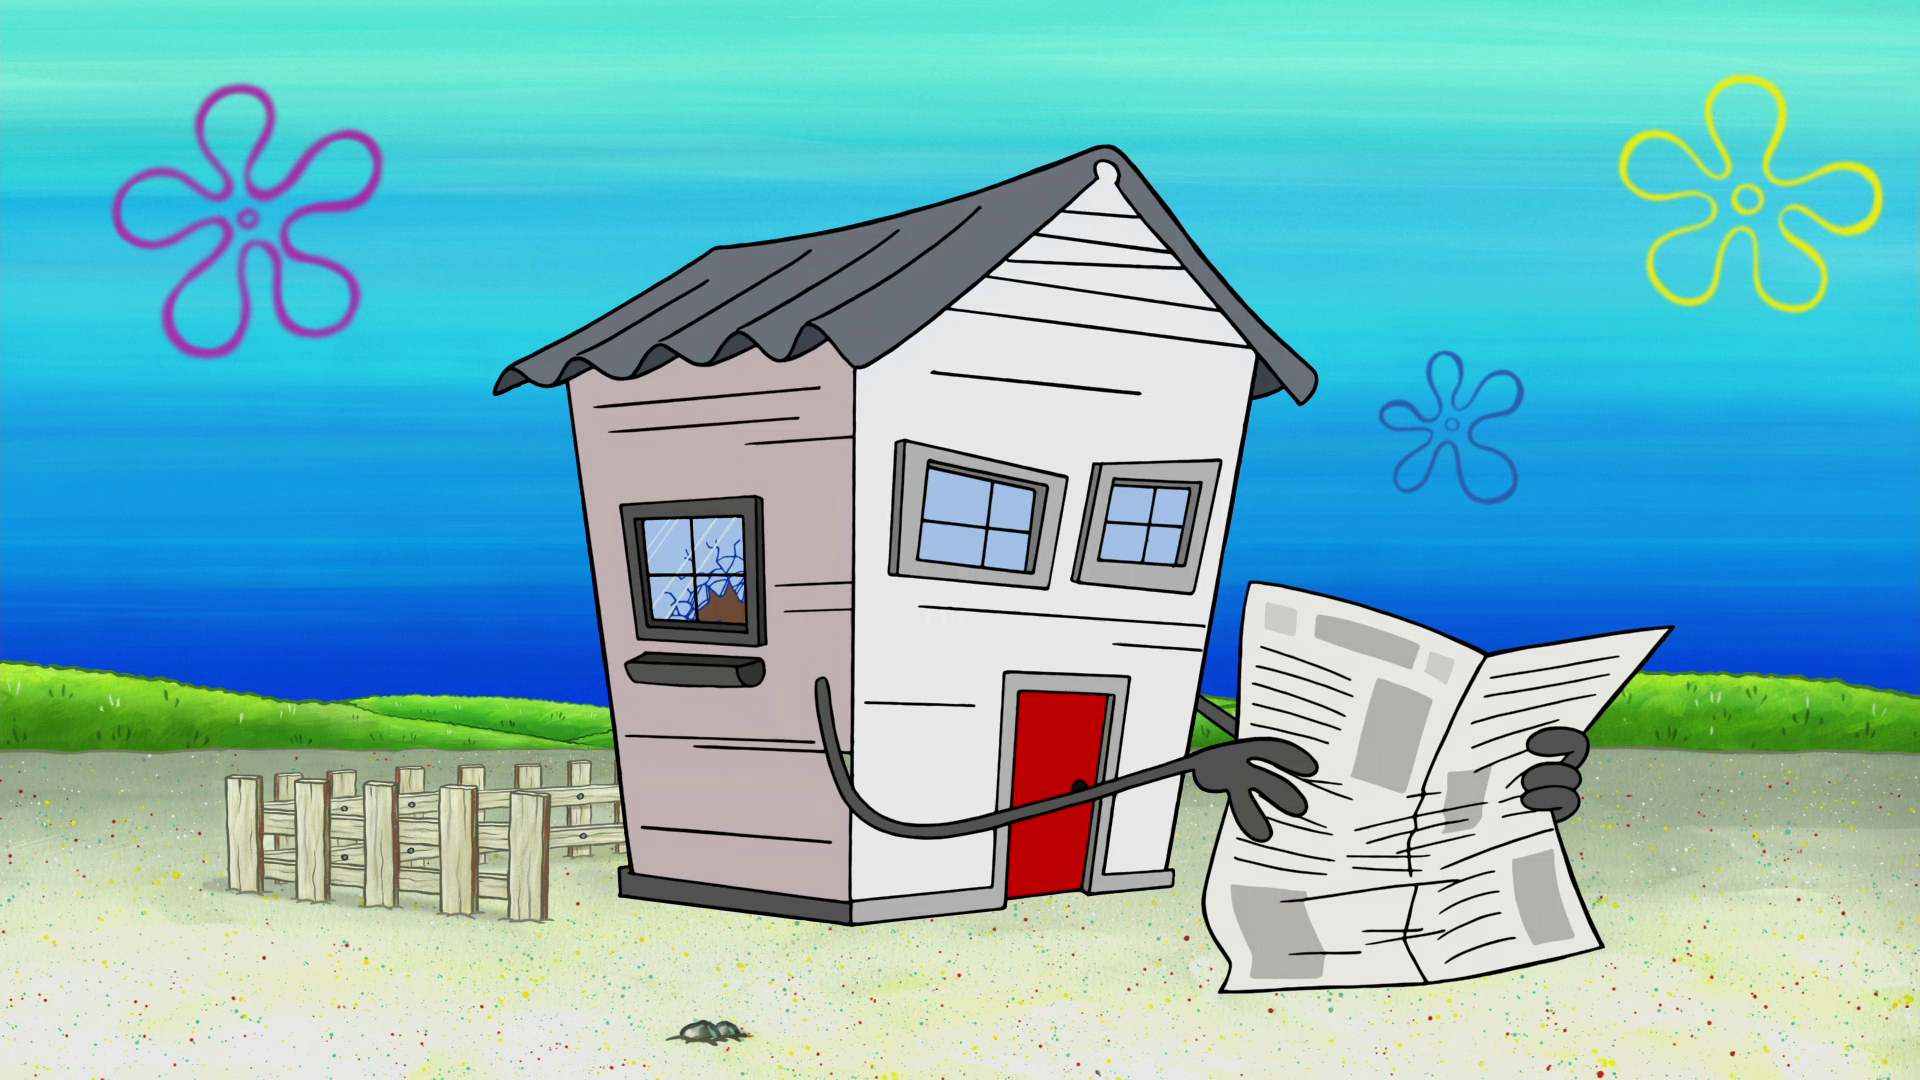 Old Man Jenkins' house